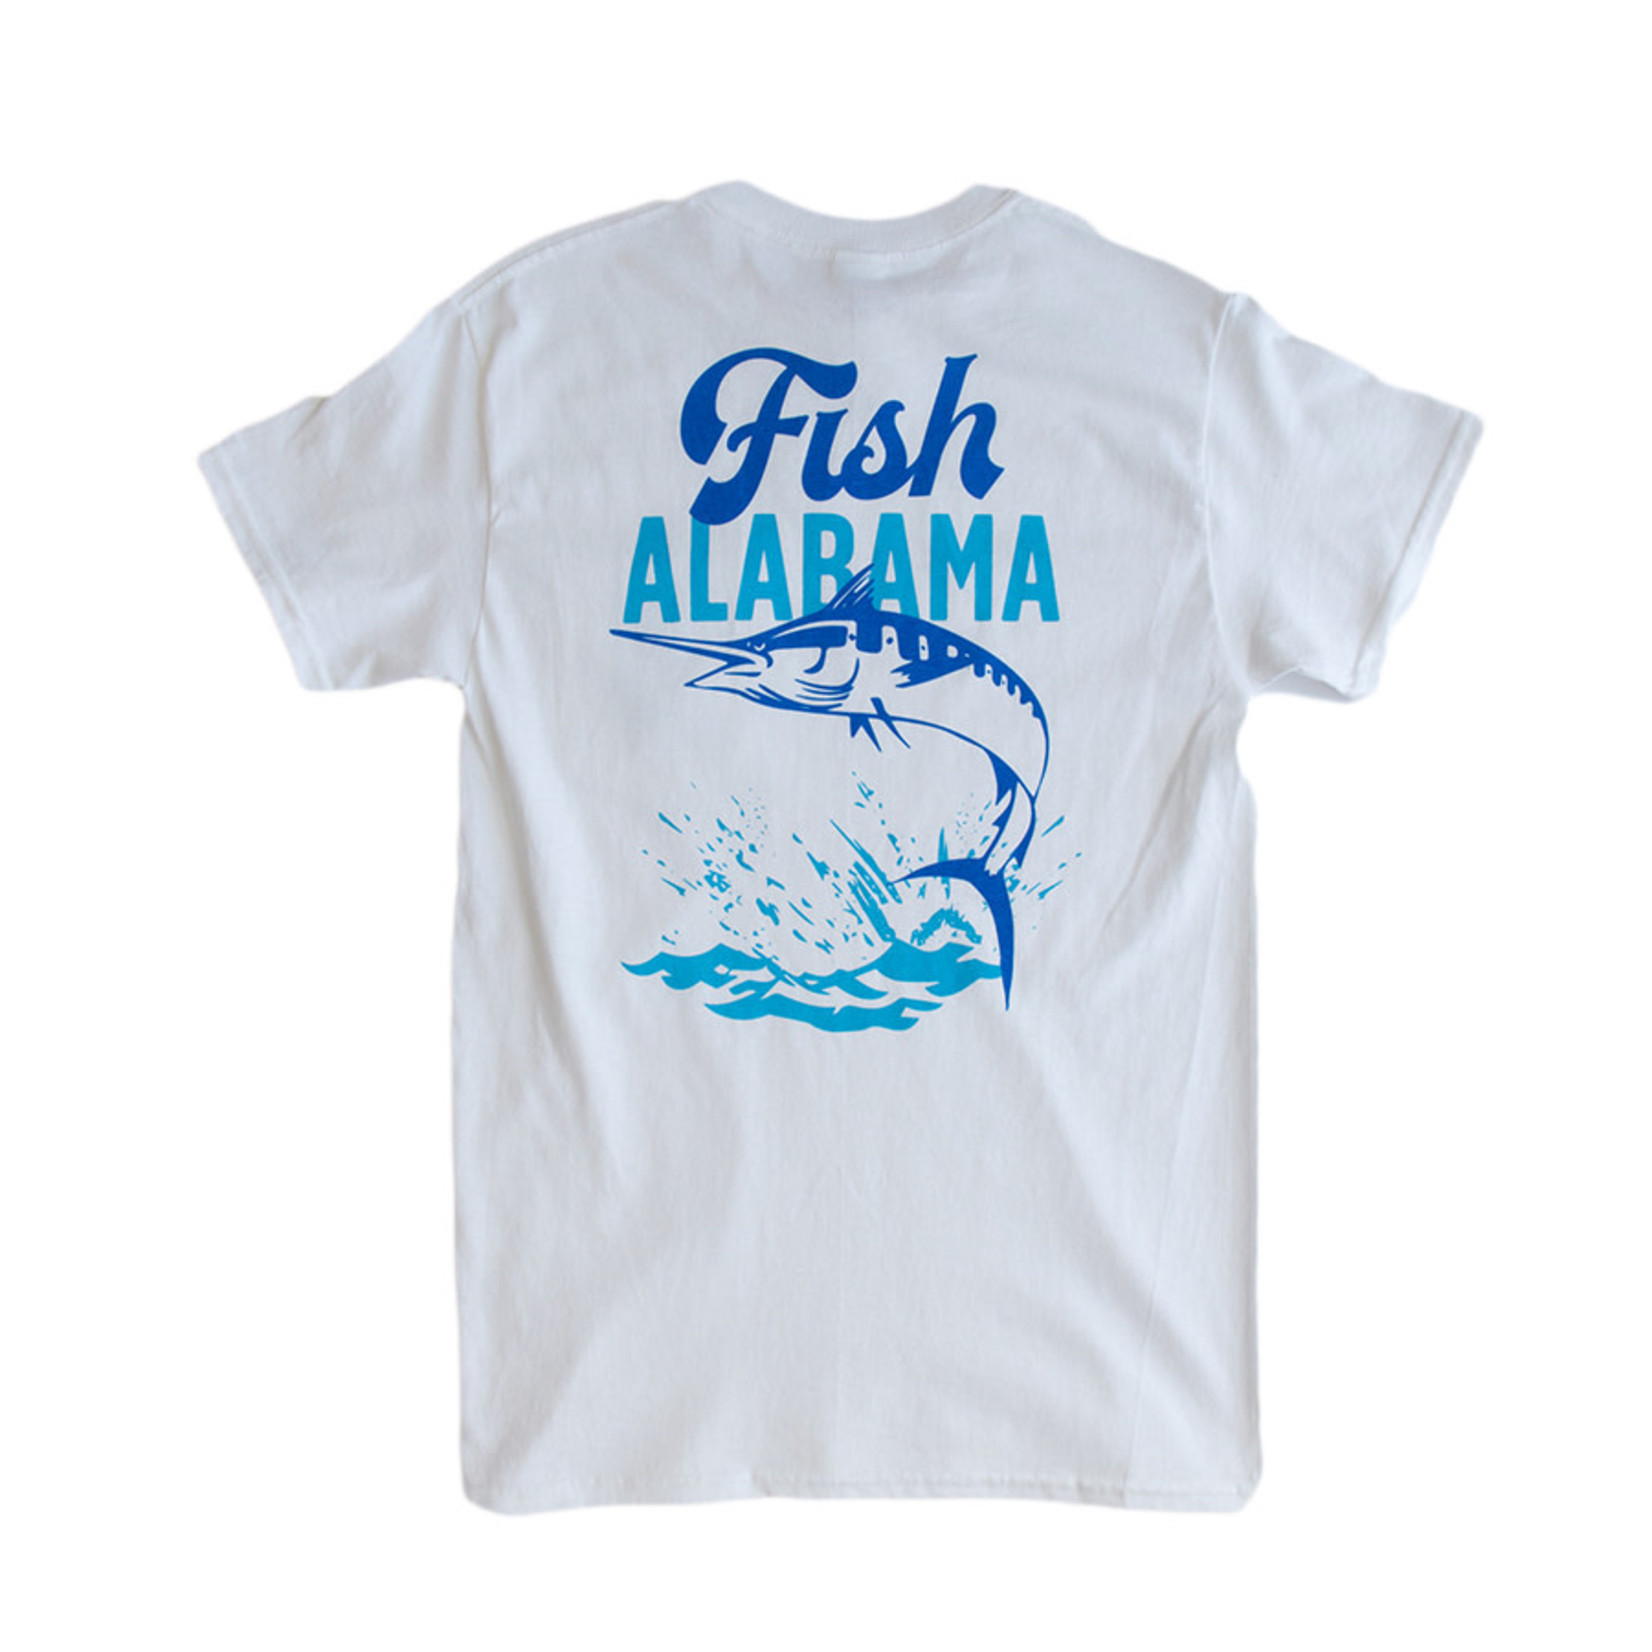 Yellowhammer Creative Fish Alabama Pocket Tee